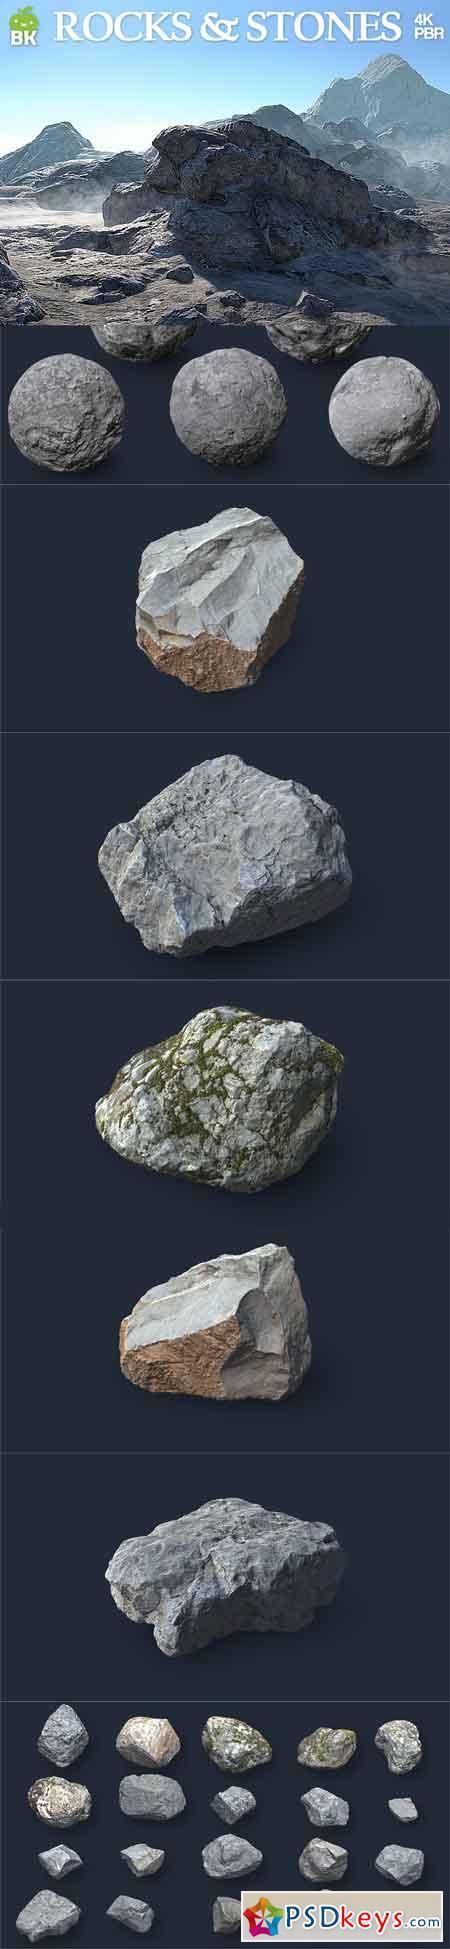 BK - HD Rocks & Stones